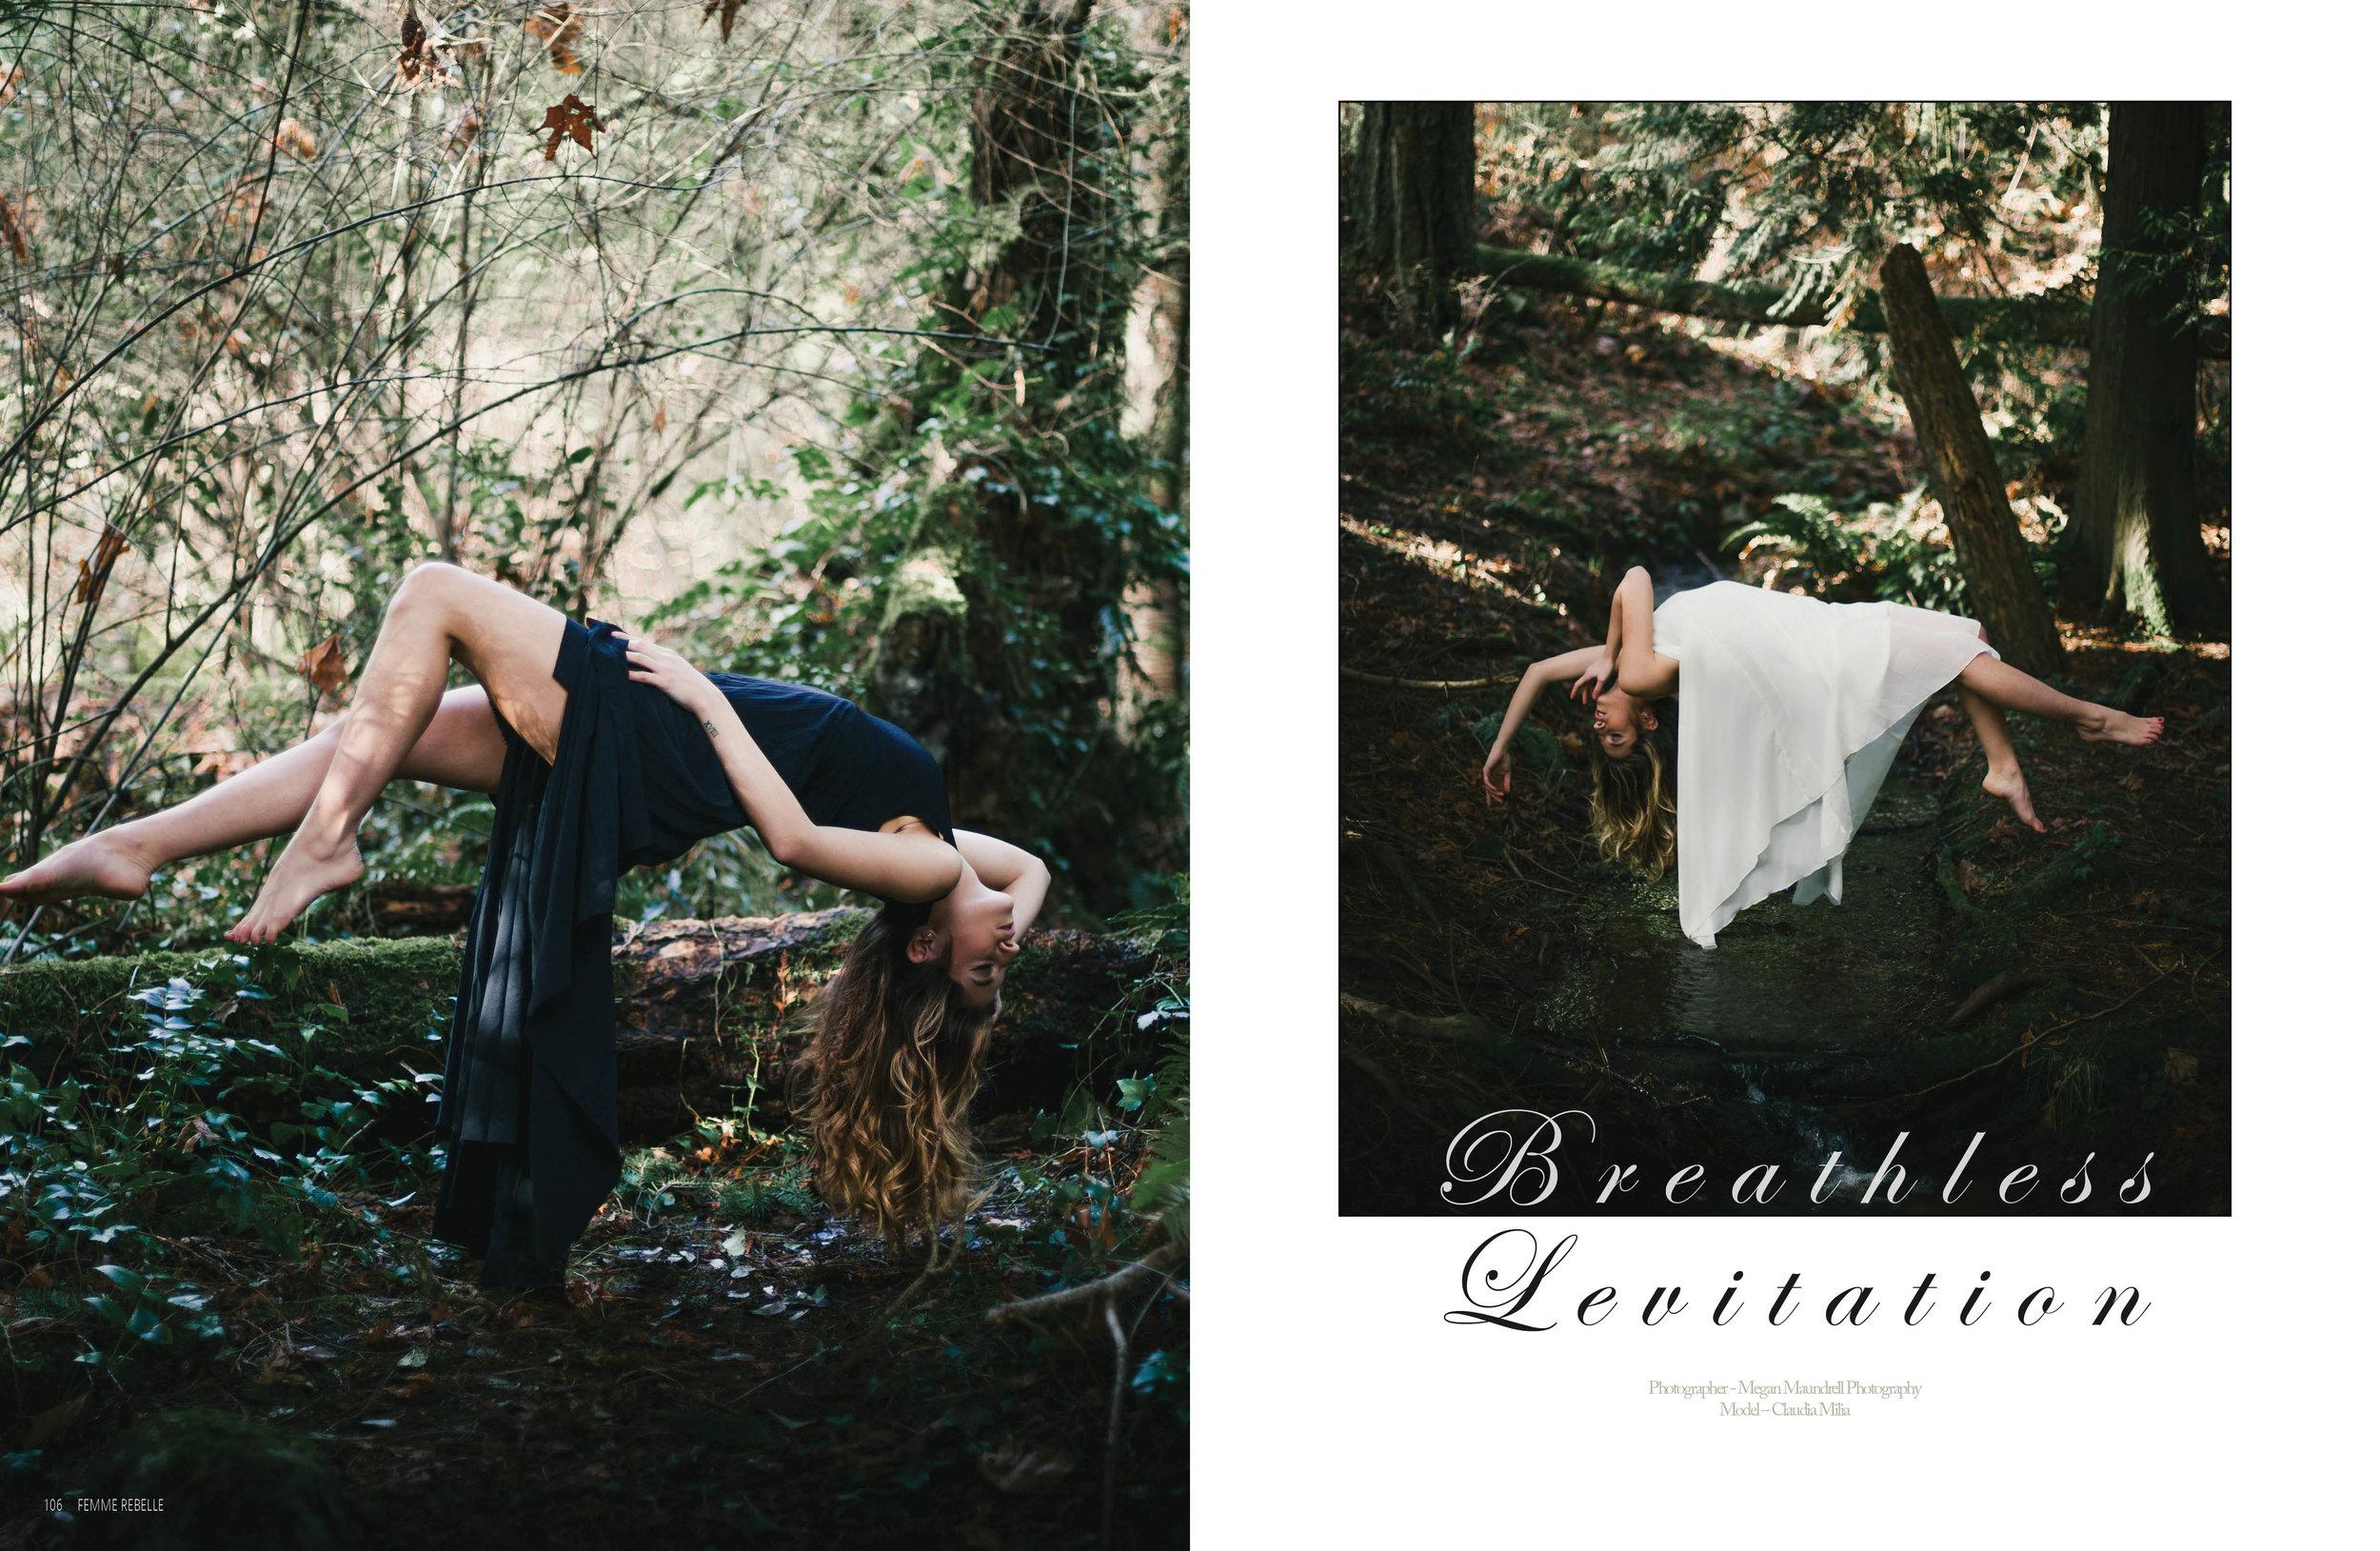 Published in Femme Rebelle Magazine - International